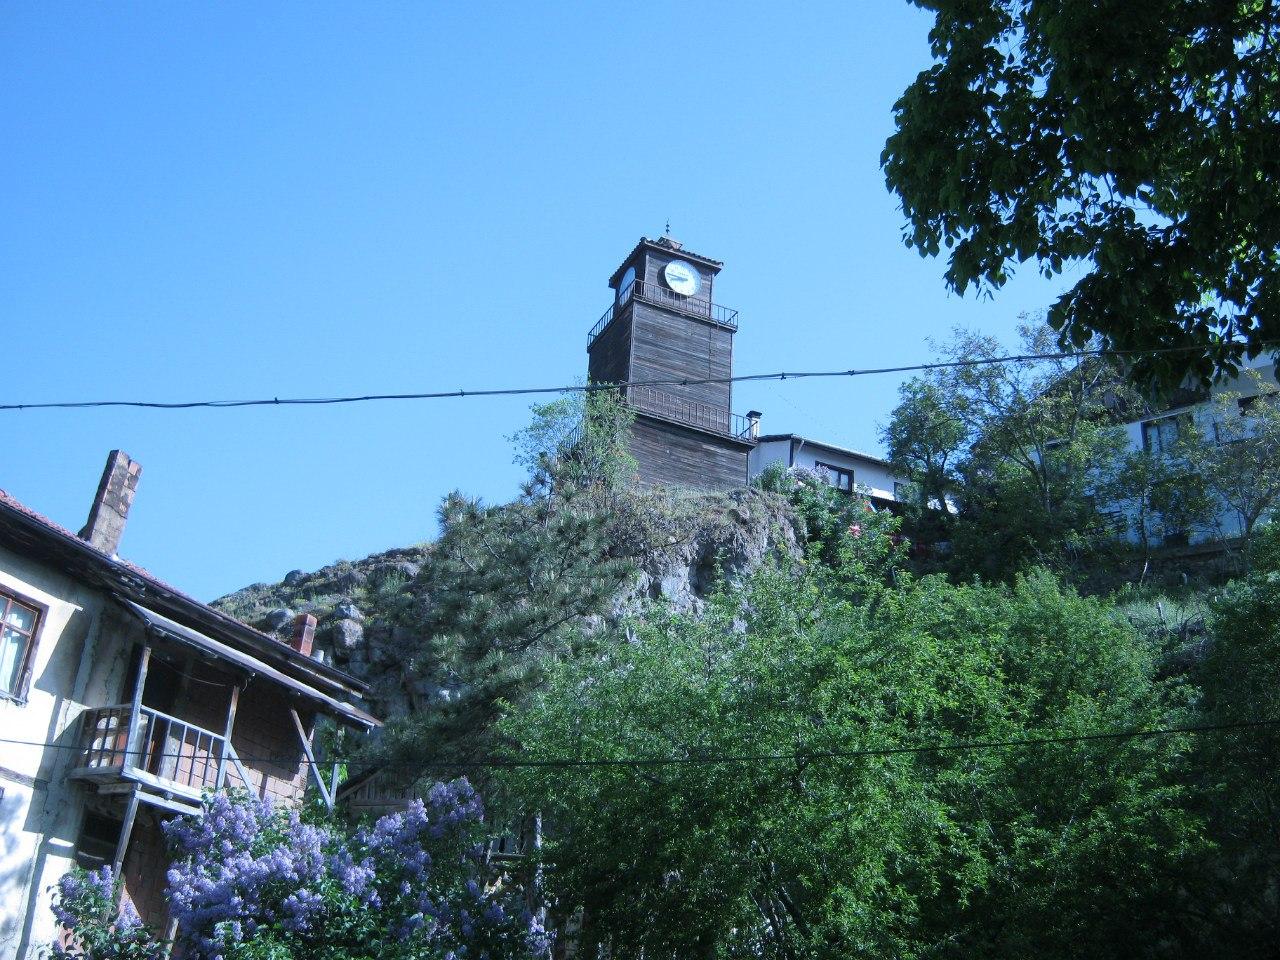 Часовая башня 19 века в Мудурну, Болу